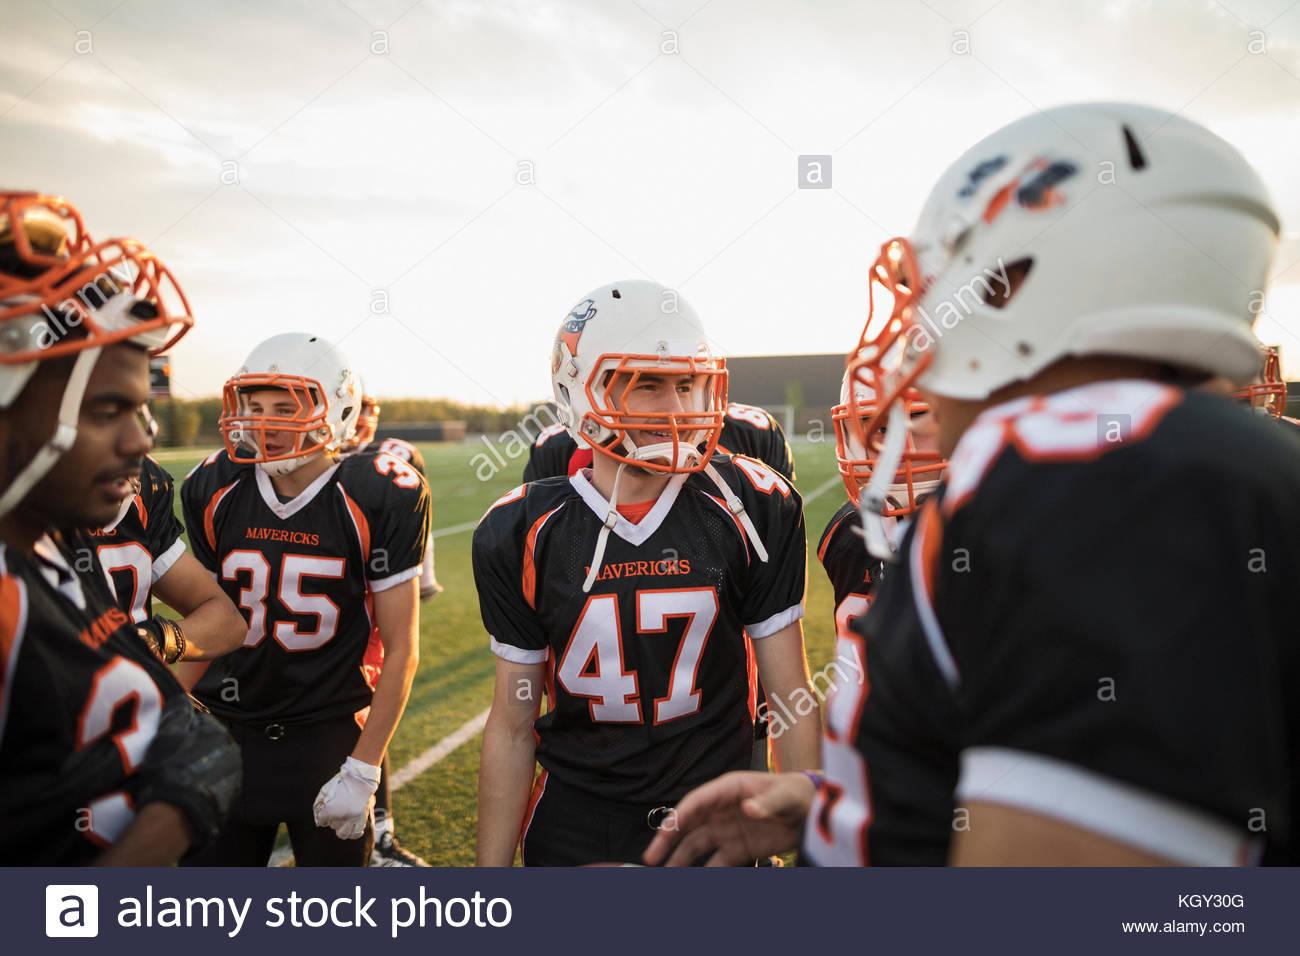 Teenage boy high school l'équipe de football de parler en caucus sur terrain de football Photo Stock